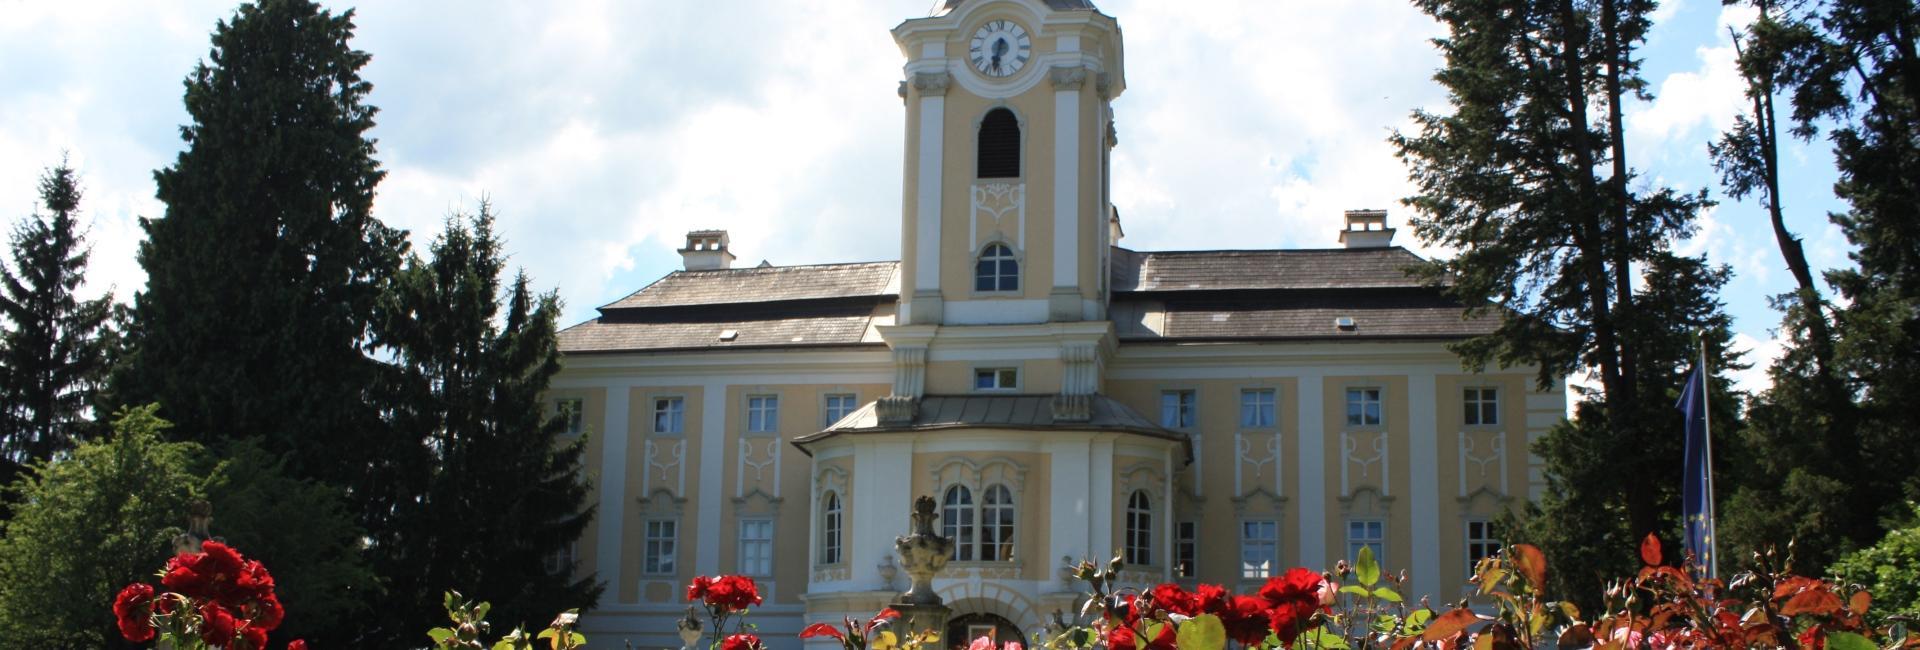 Castle Hotel Rosenau